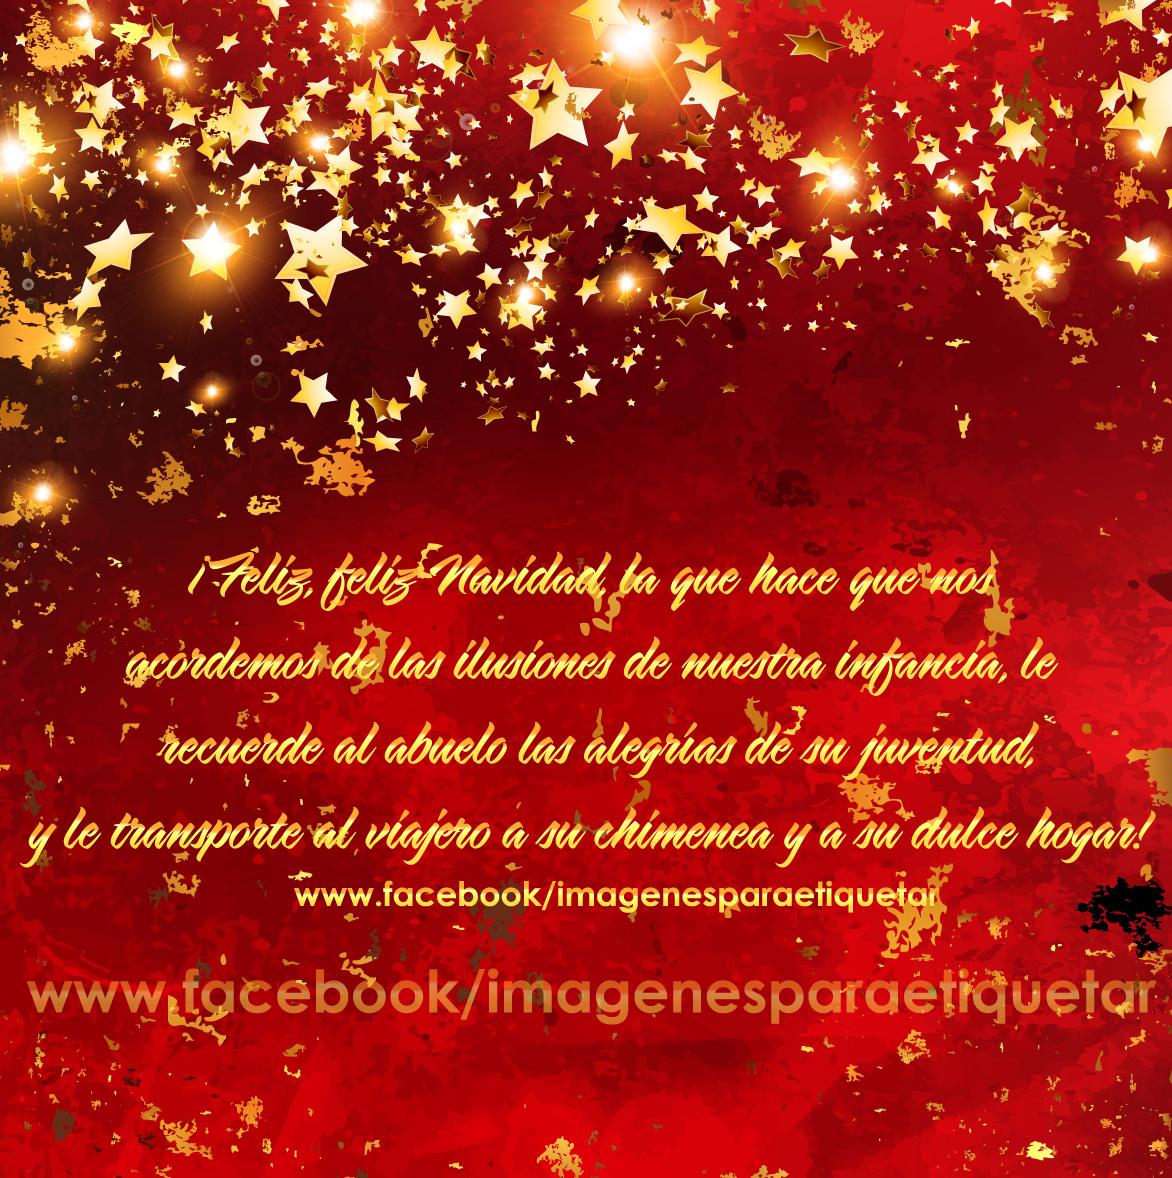 Frases Navidad Para Empresas.Frases De Navidad Para Empresas Quotes Links